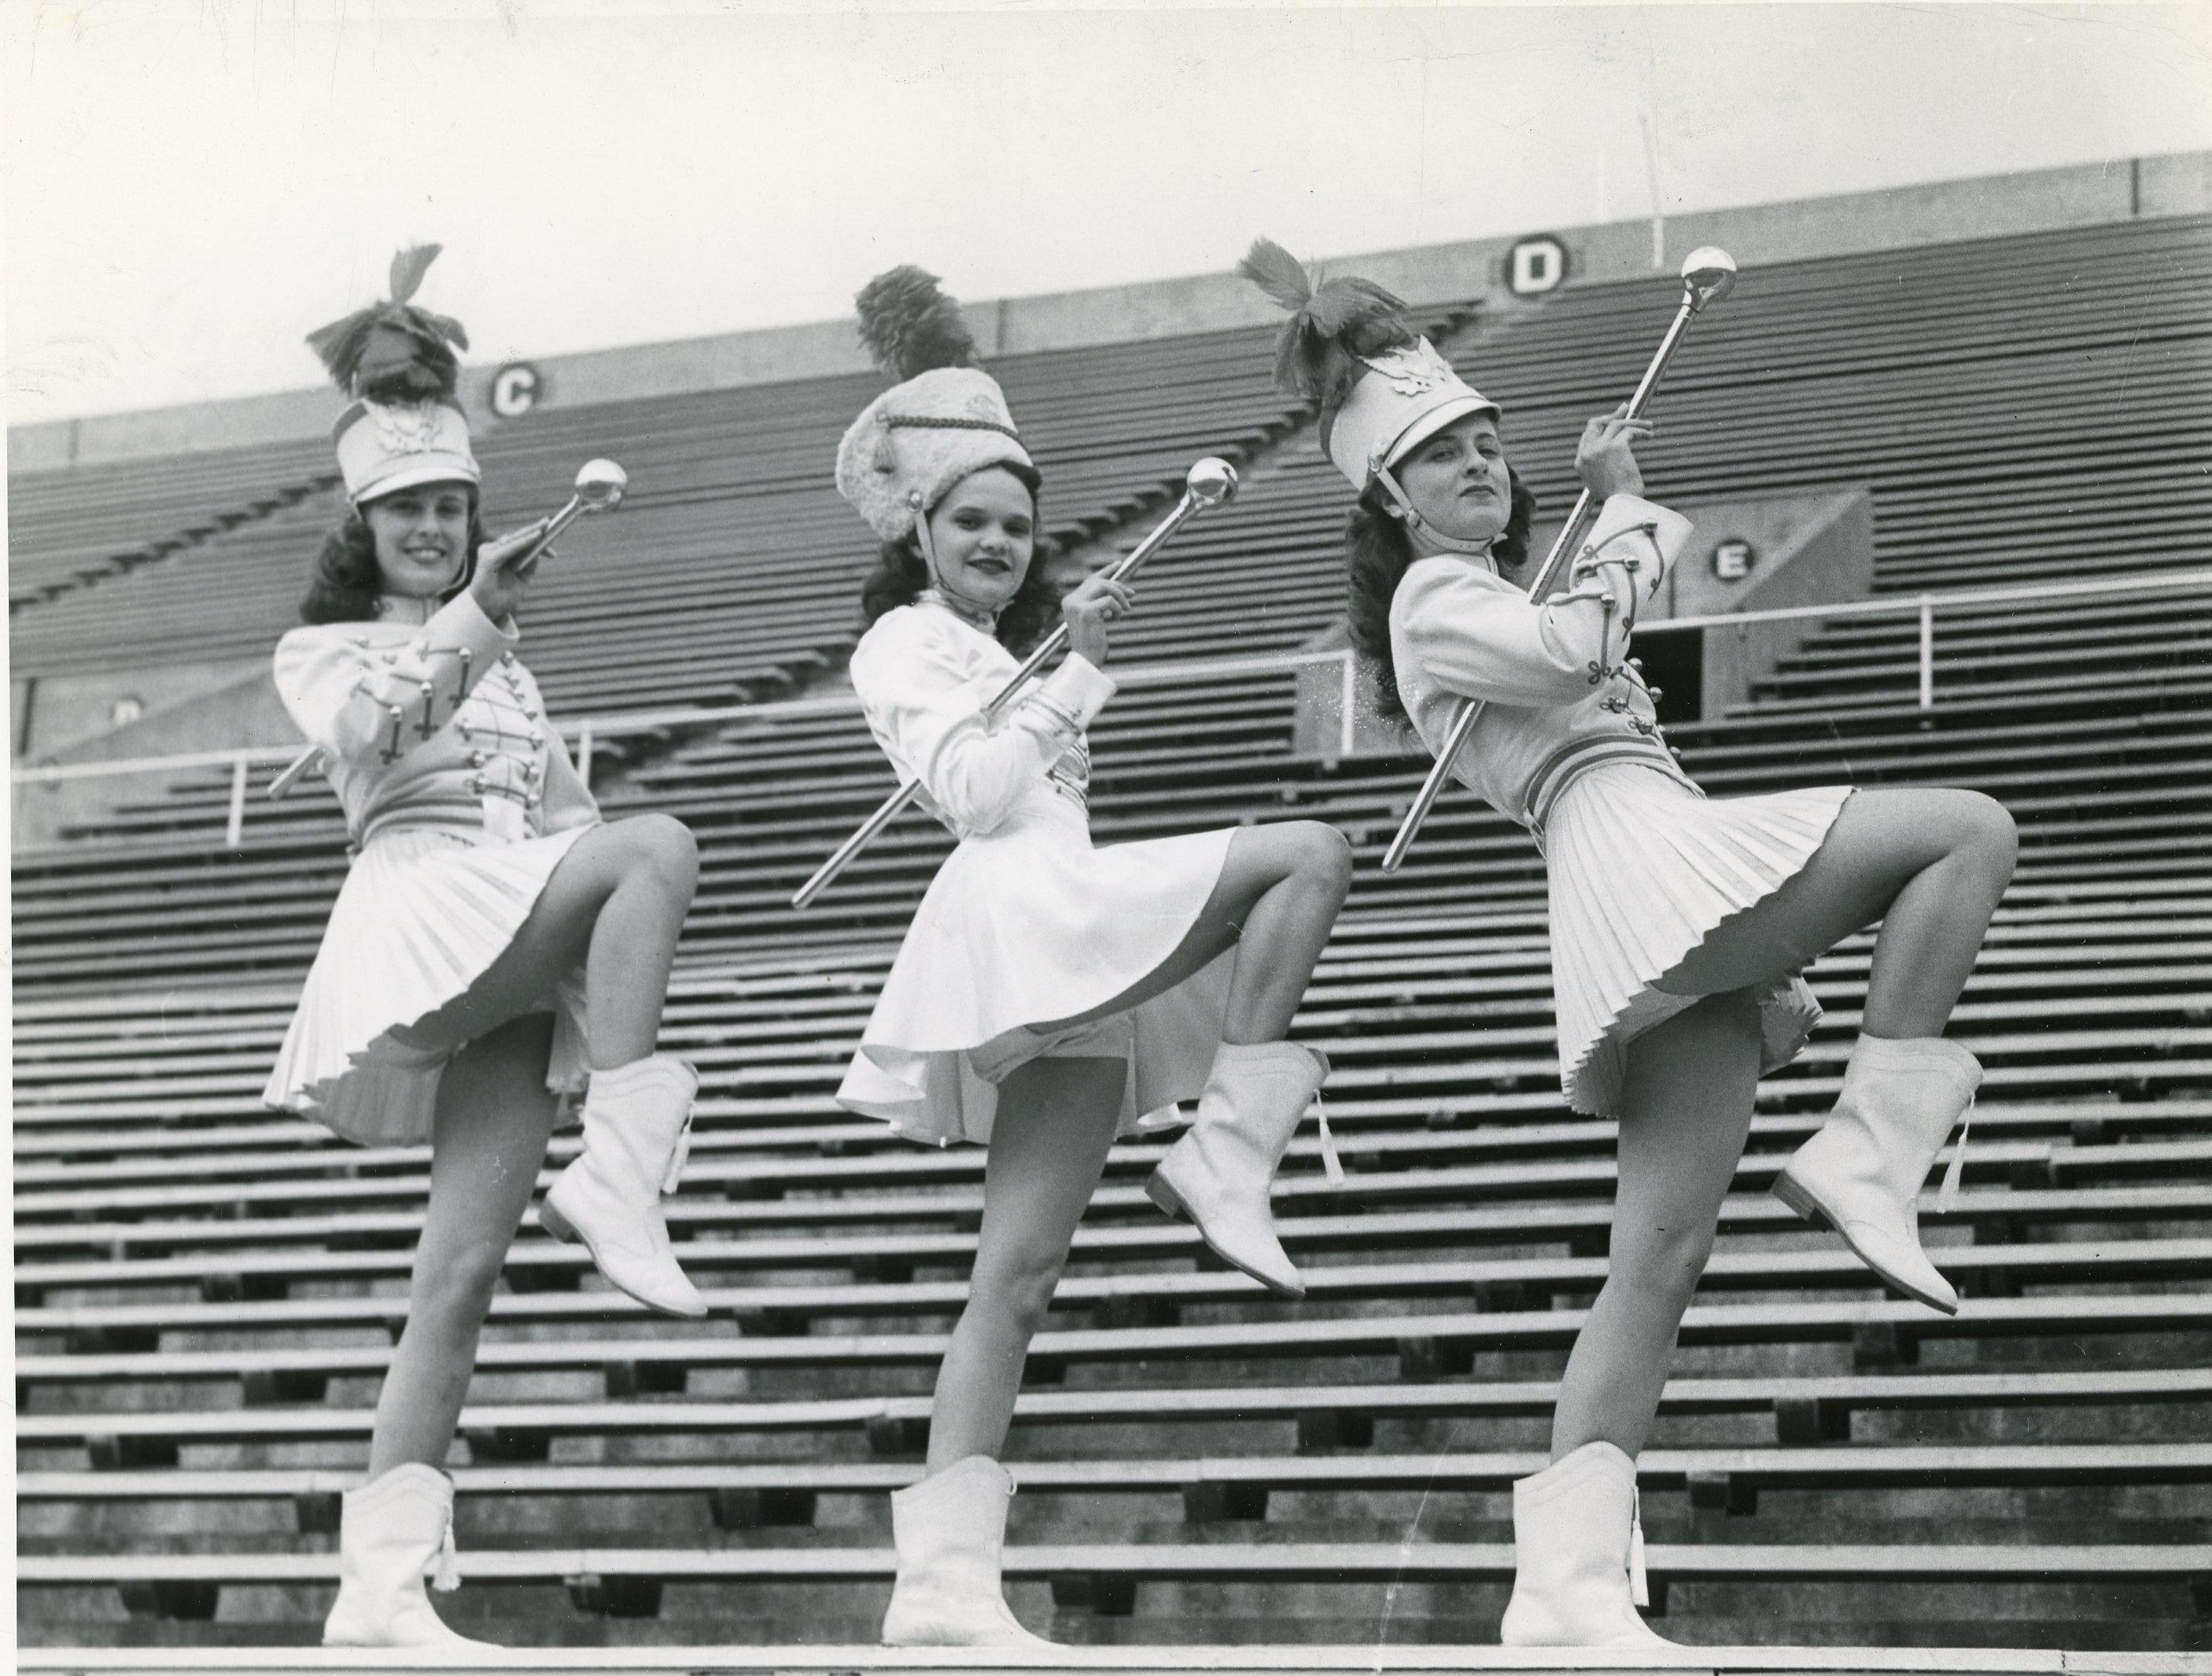 University of Tennessee 1948 majorettes Patty Shaw, Celestine Alonso and Jane Chapin.